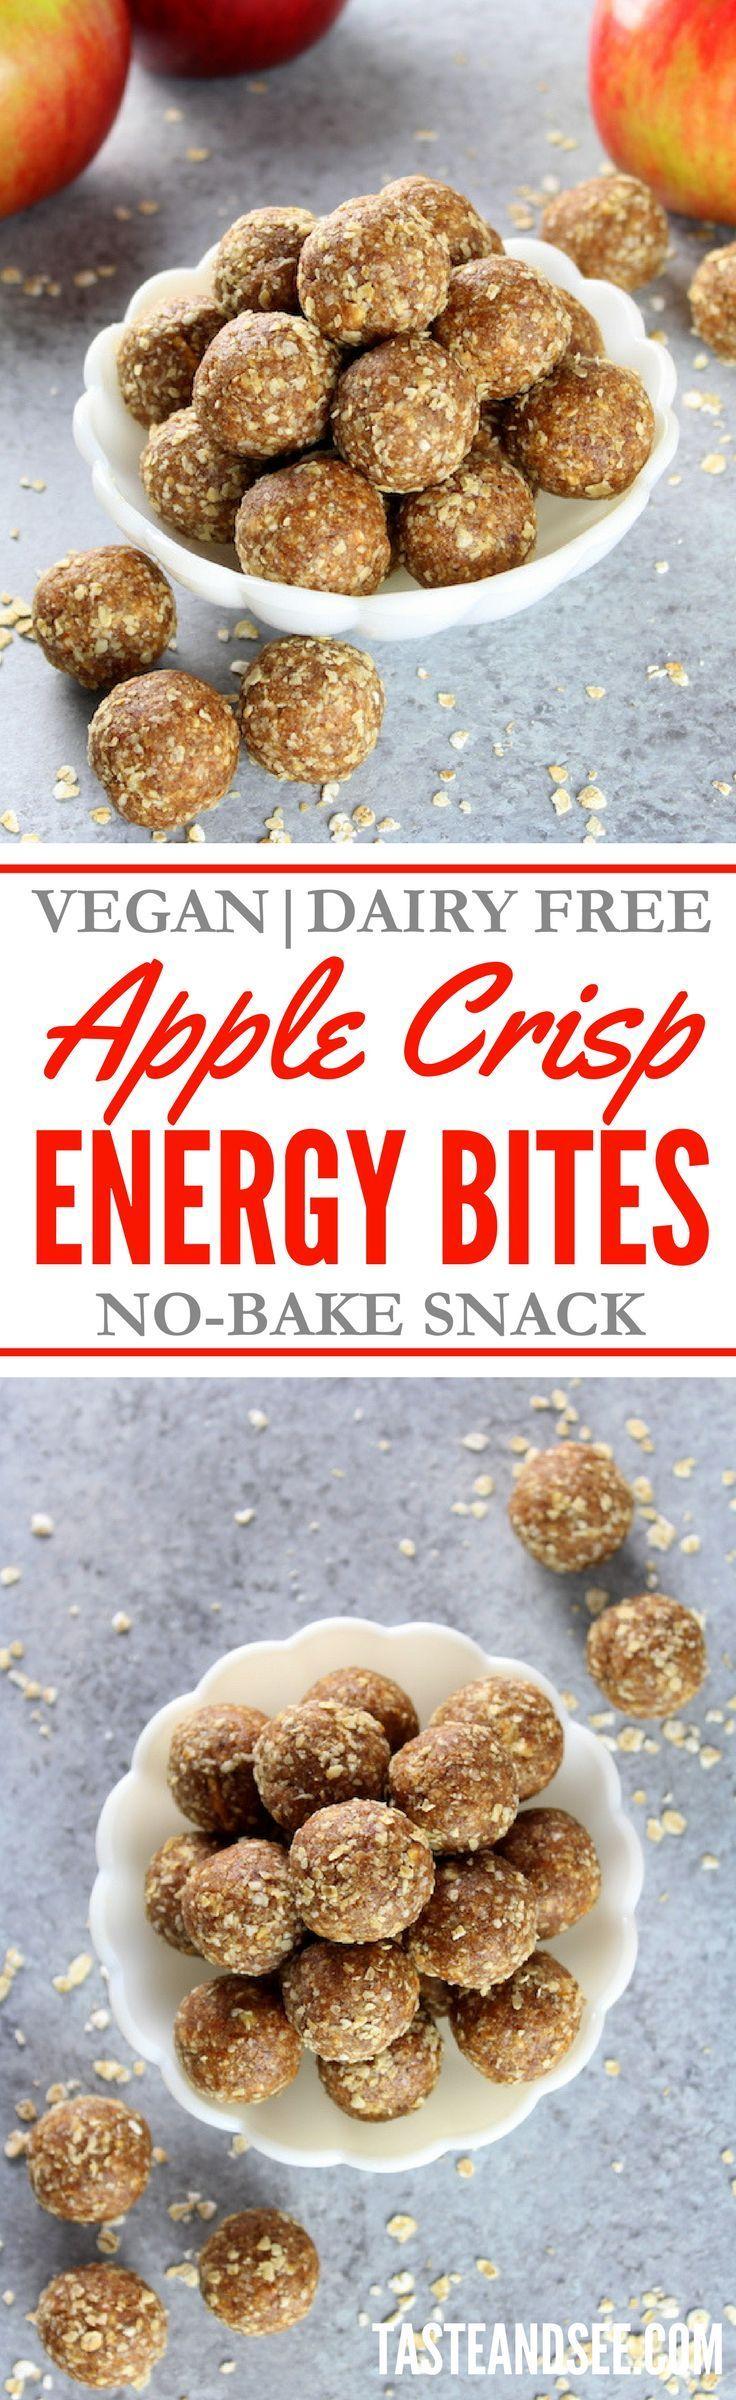 Apple Crisp Energy Bites! No Bake | Dairy-Free | 5-Minute| http://tasteandsee.com